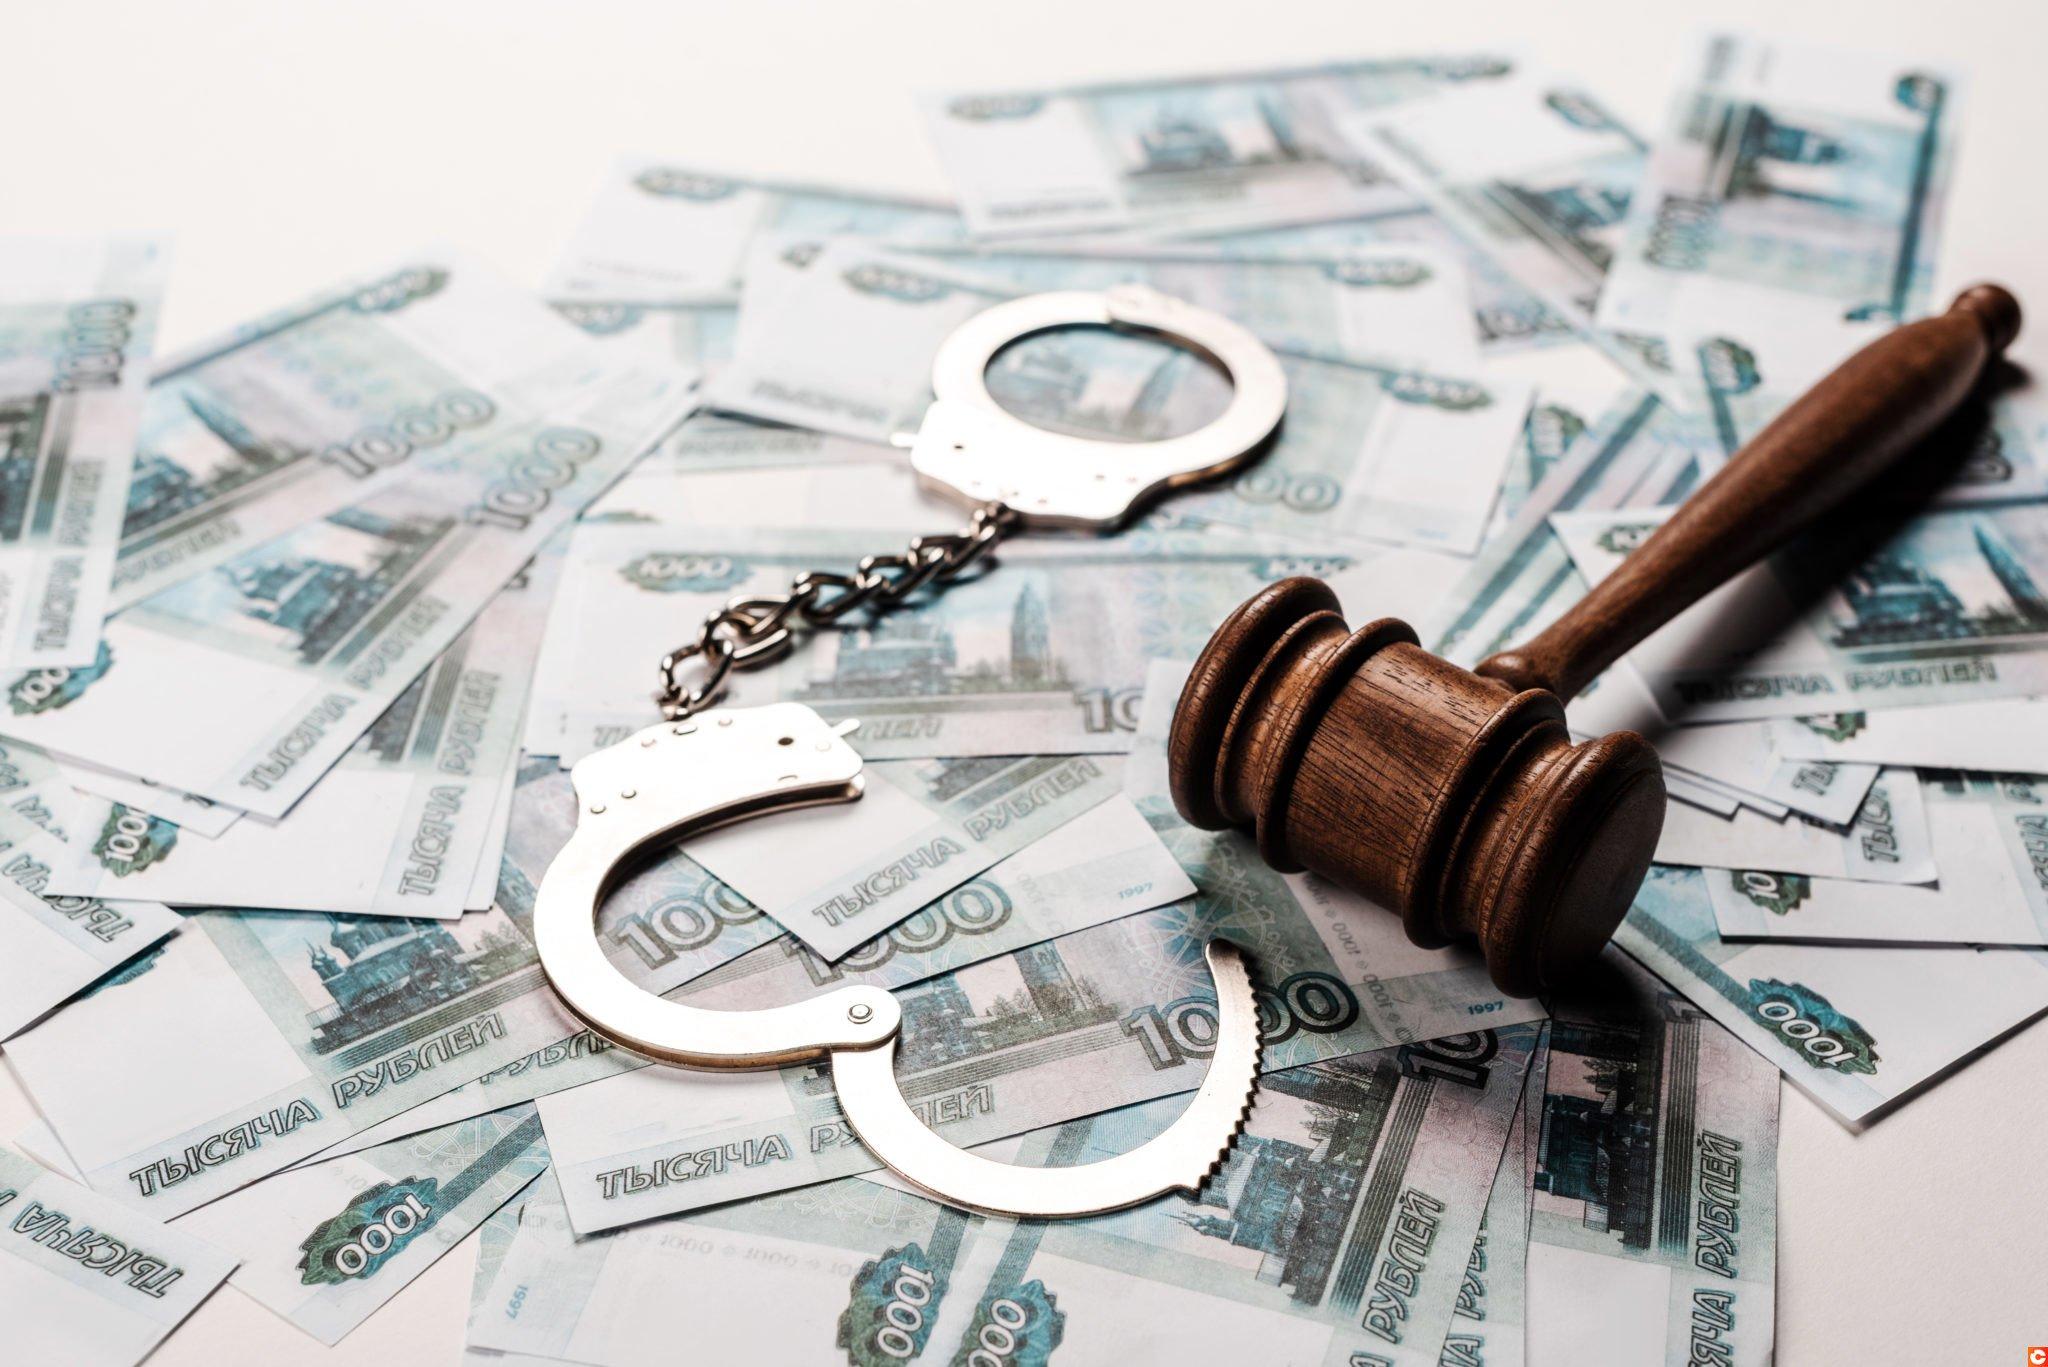 selective focus of gavel near metallic handcuffs on russian money